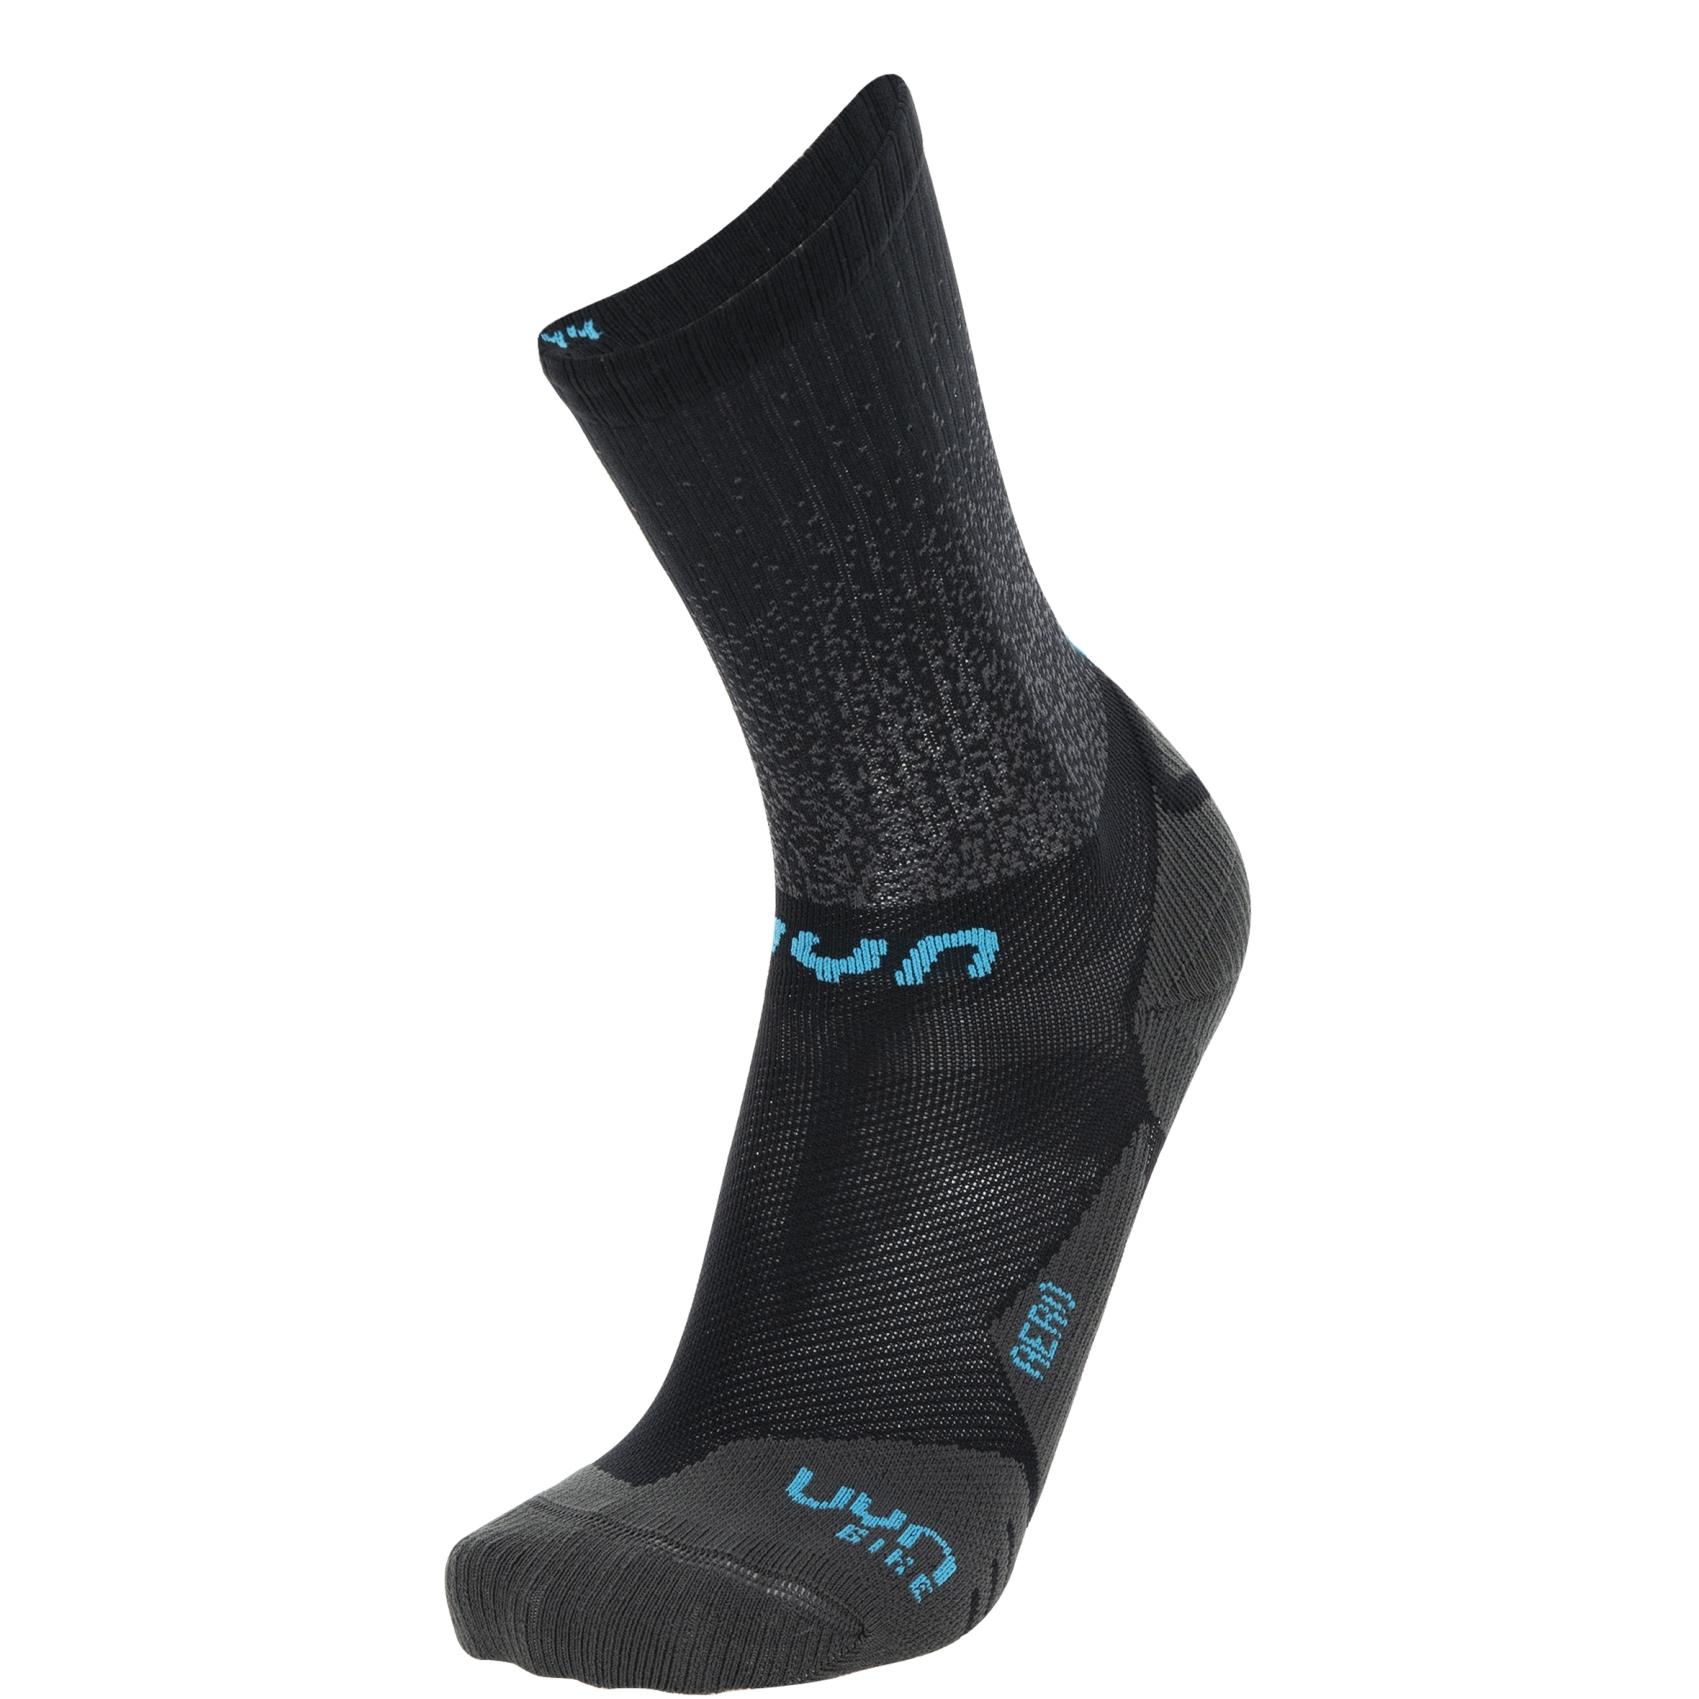 UYN Cycling Aero Socken - Schwarz/Türkis